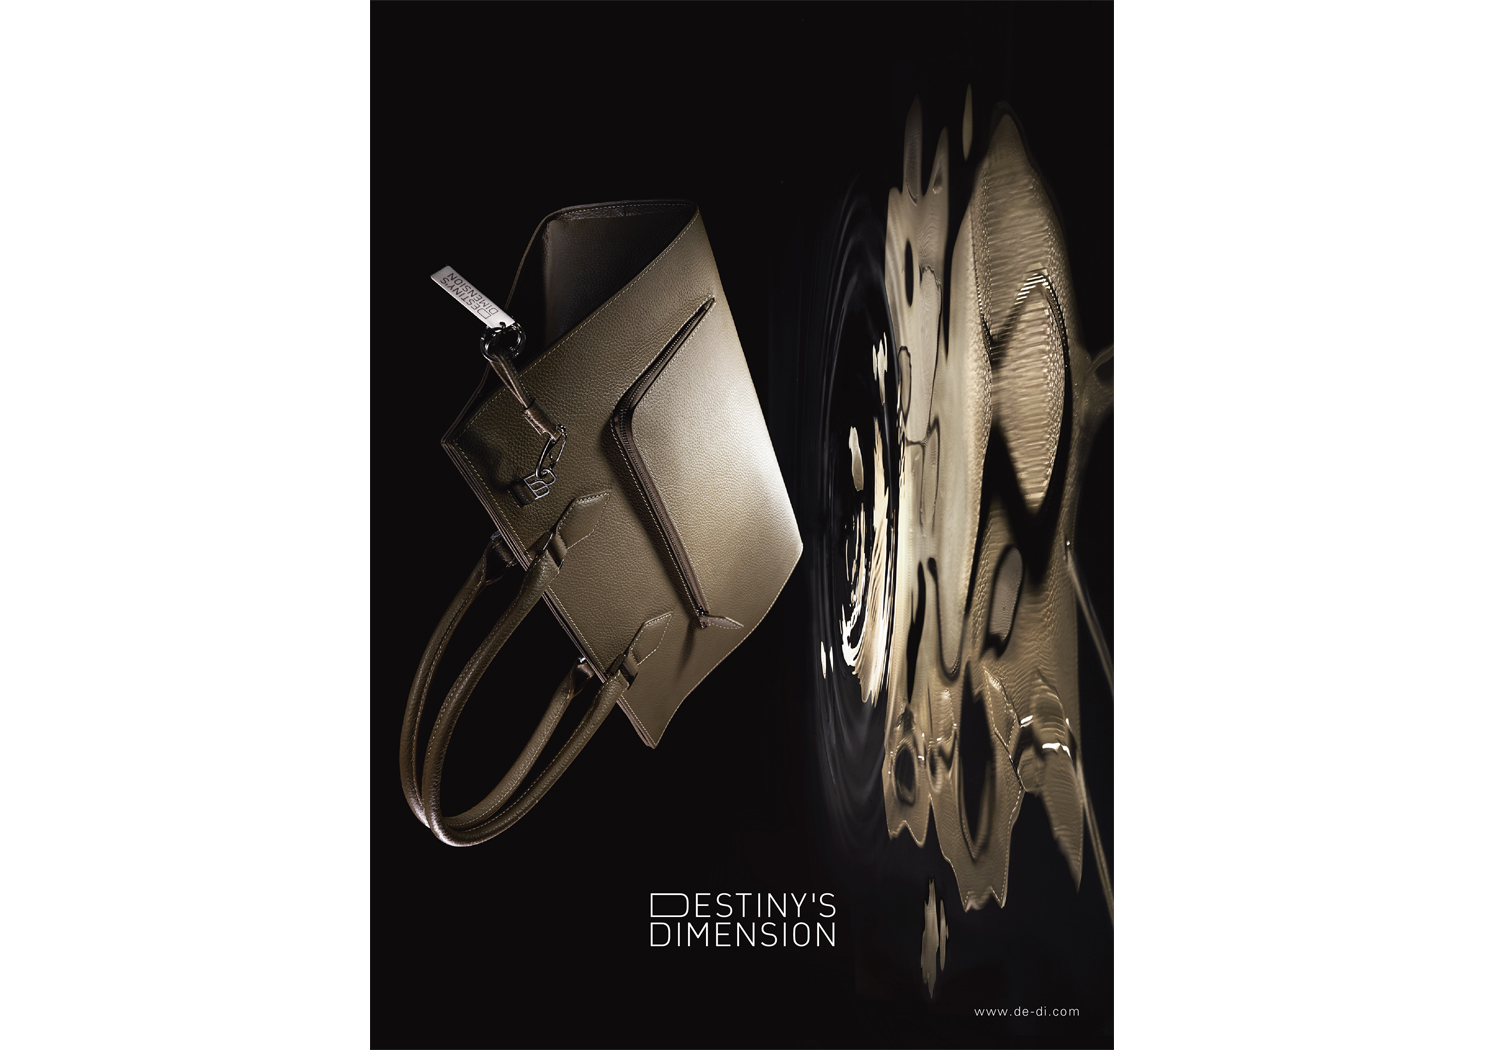 Destiny's Dimension Poster 2015